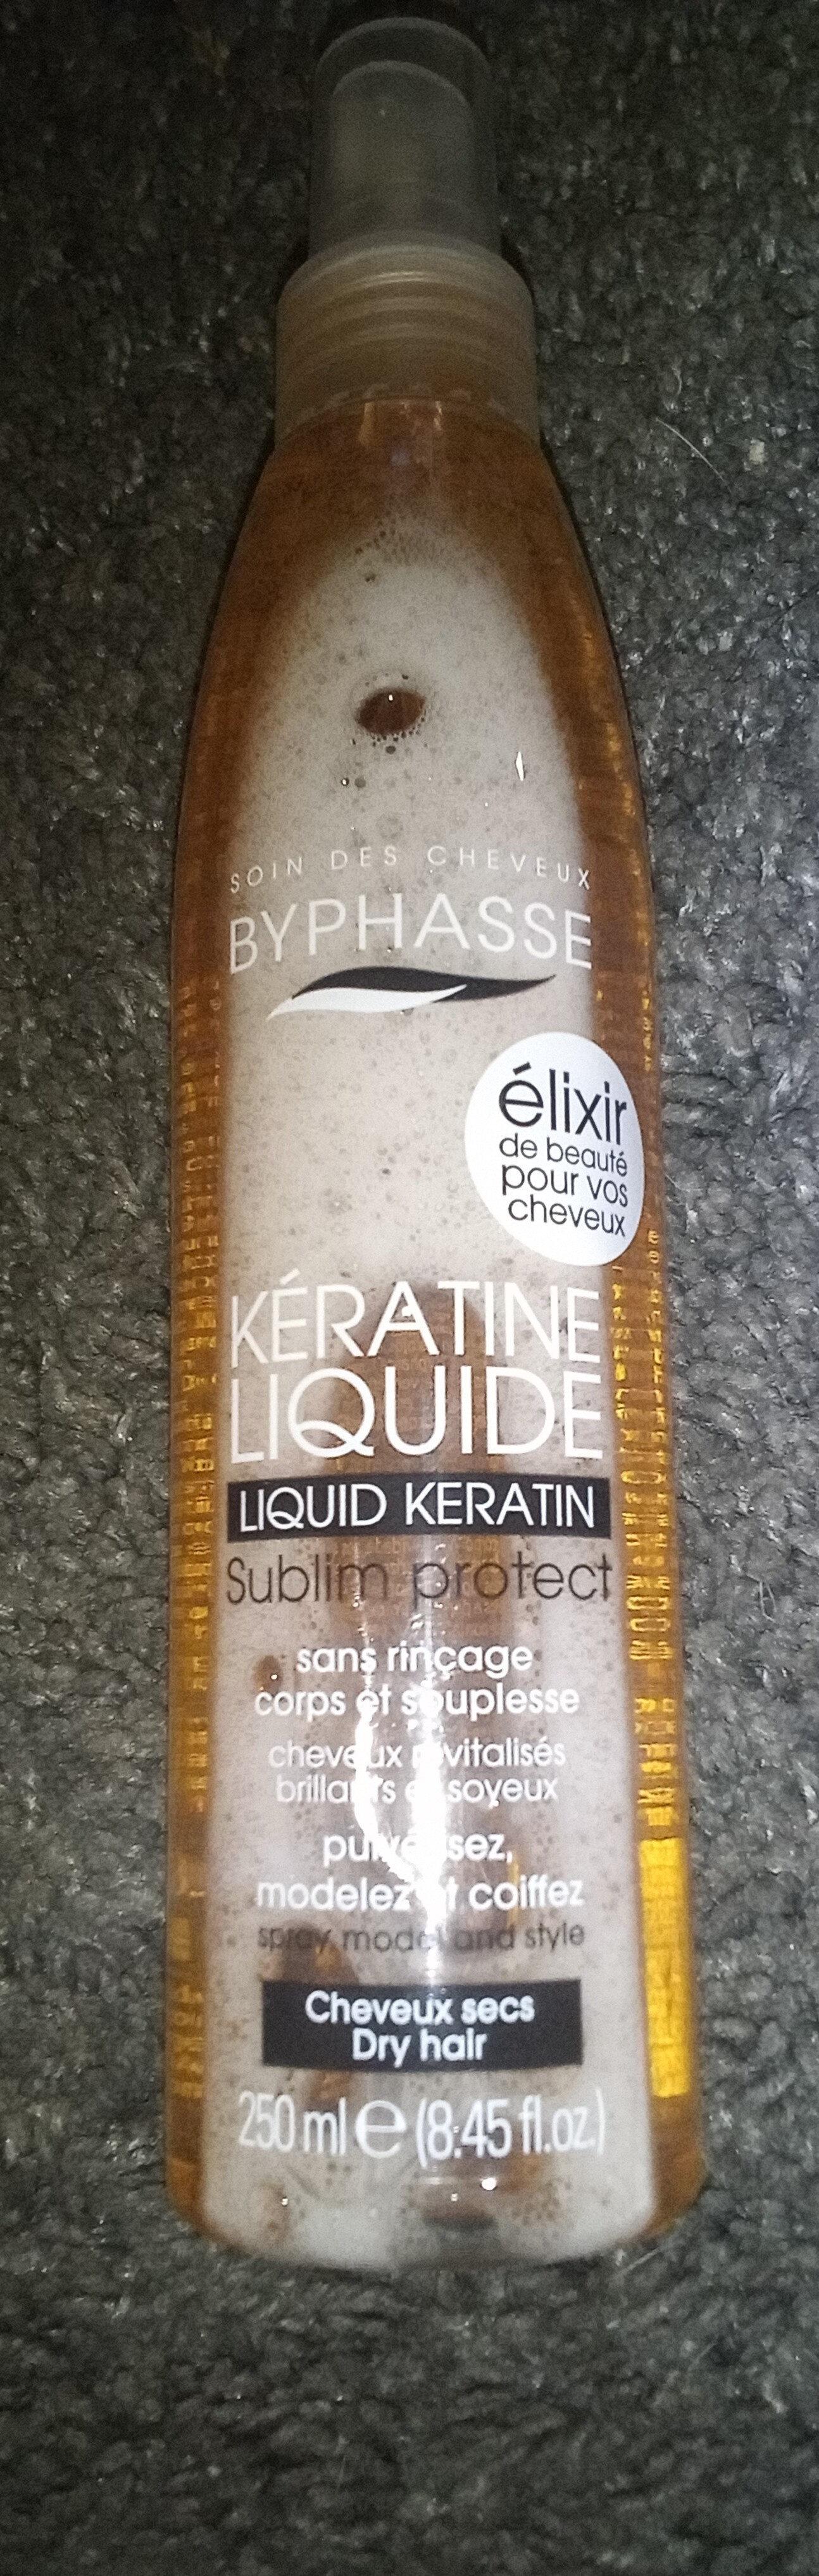 kératine liquide - Product - fr